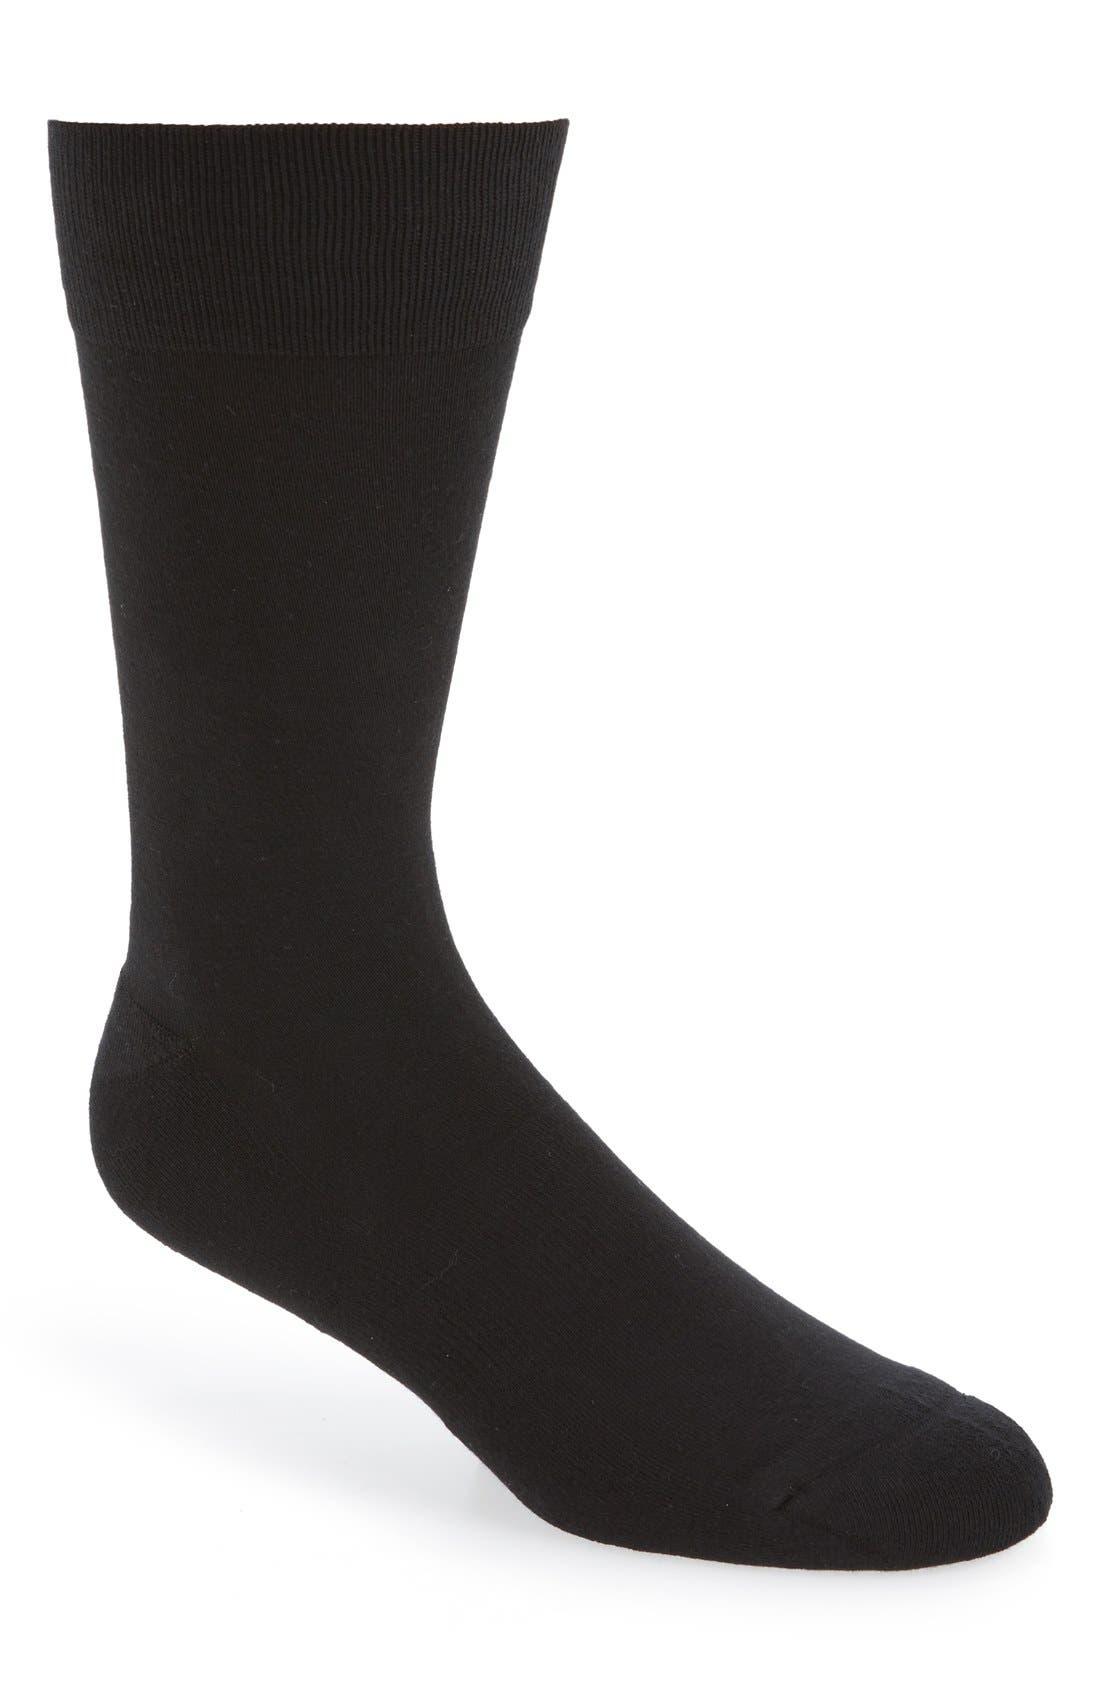 Cushion Foot Arch Support Socks,                             Main thumbnail 1, color,                             BLACK